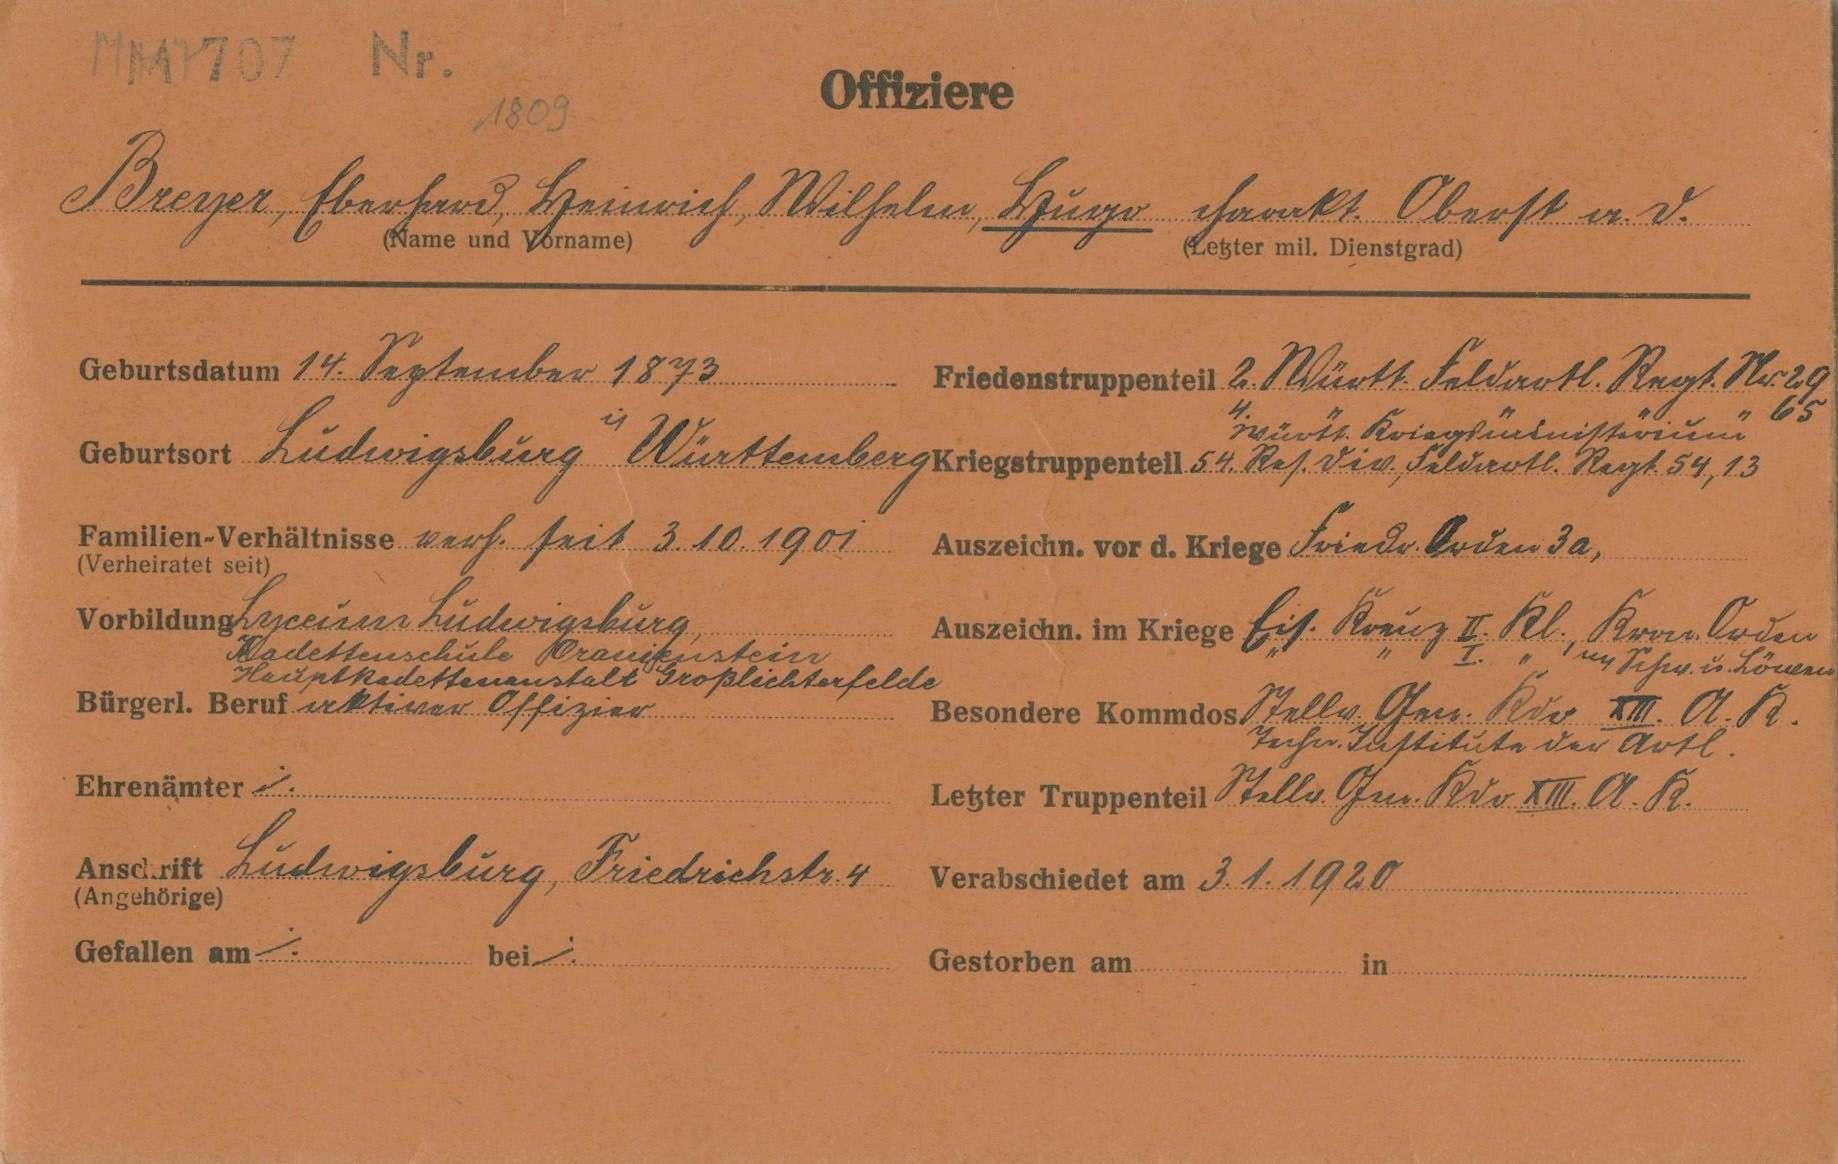 Breyer, (Eberhard Heinrich Wilhelm) Hugo, Bild 1